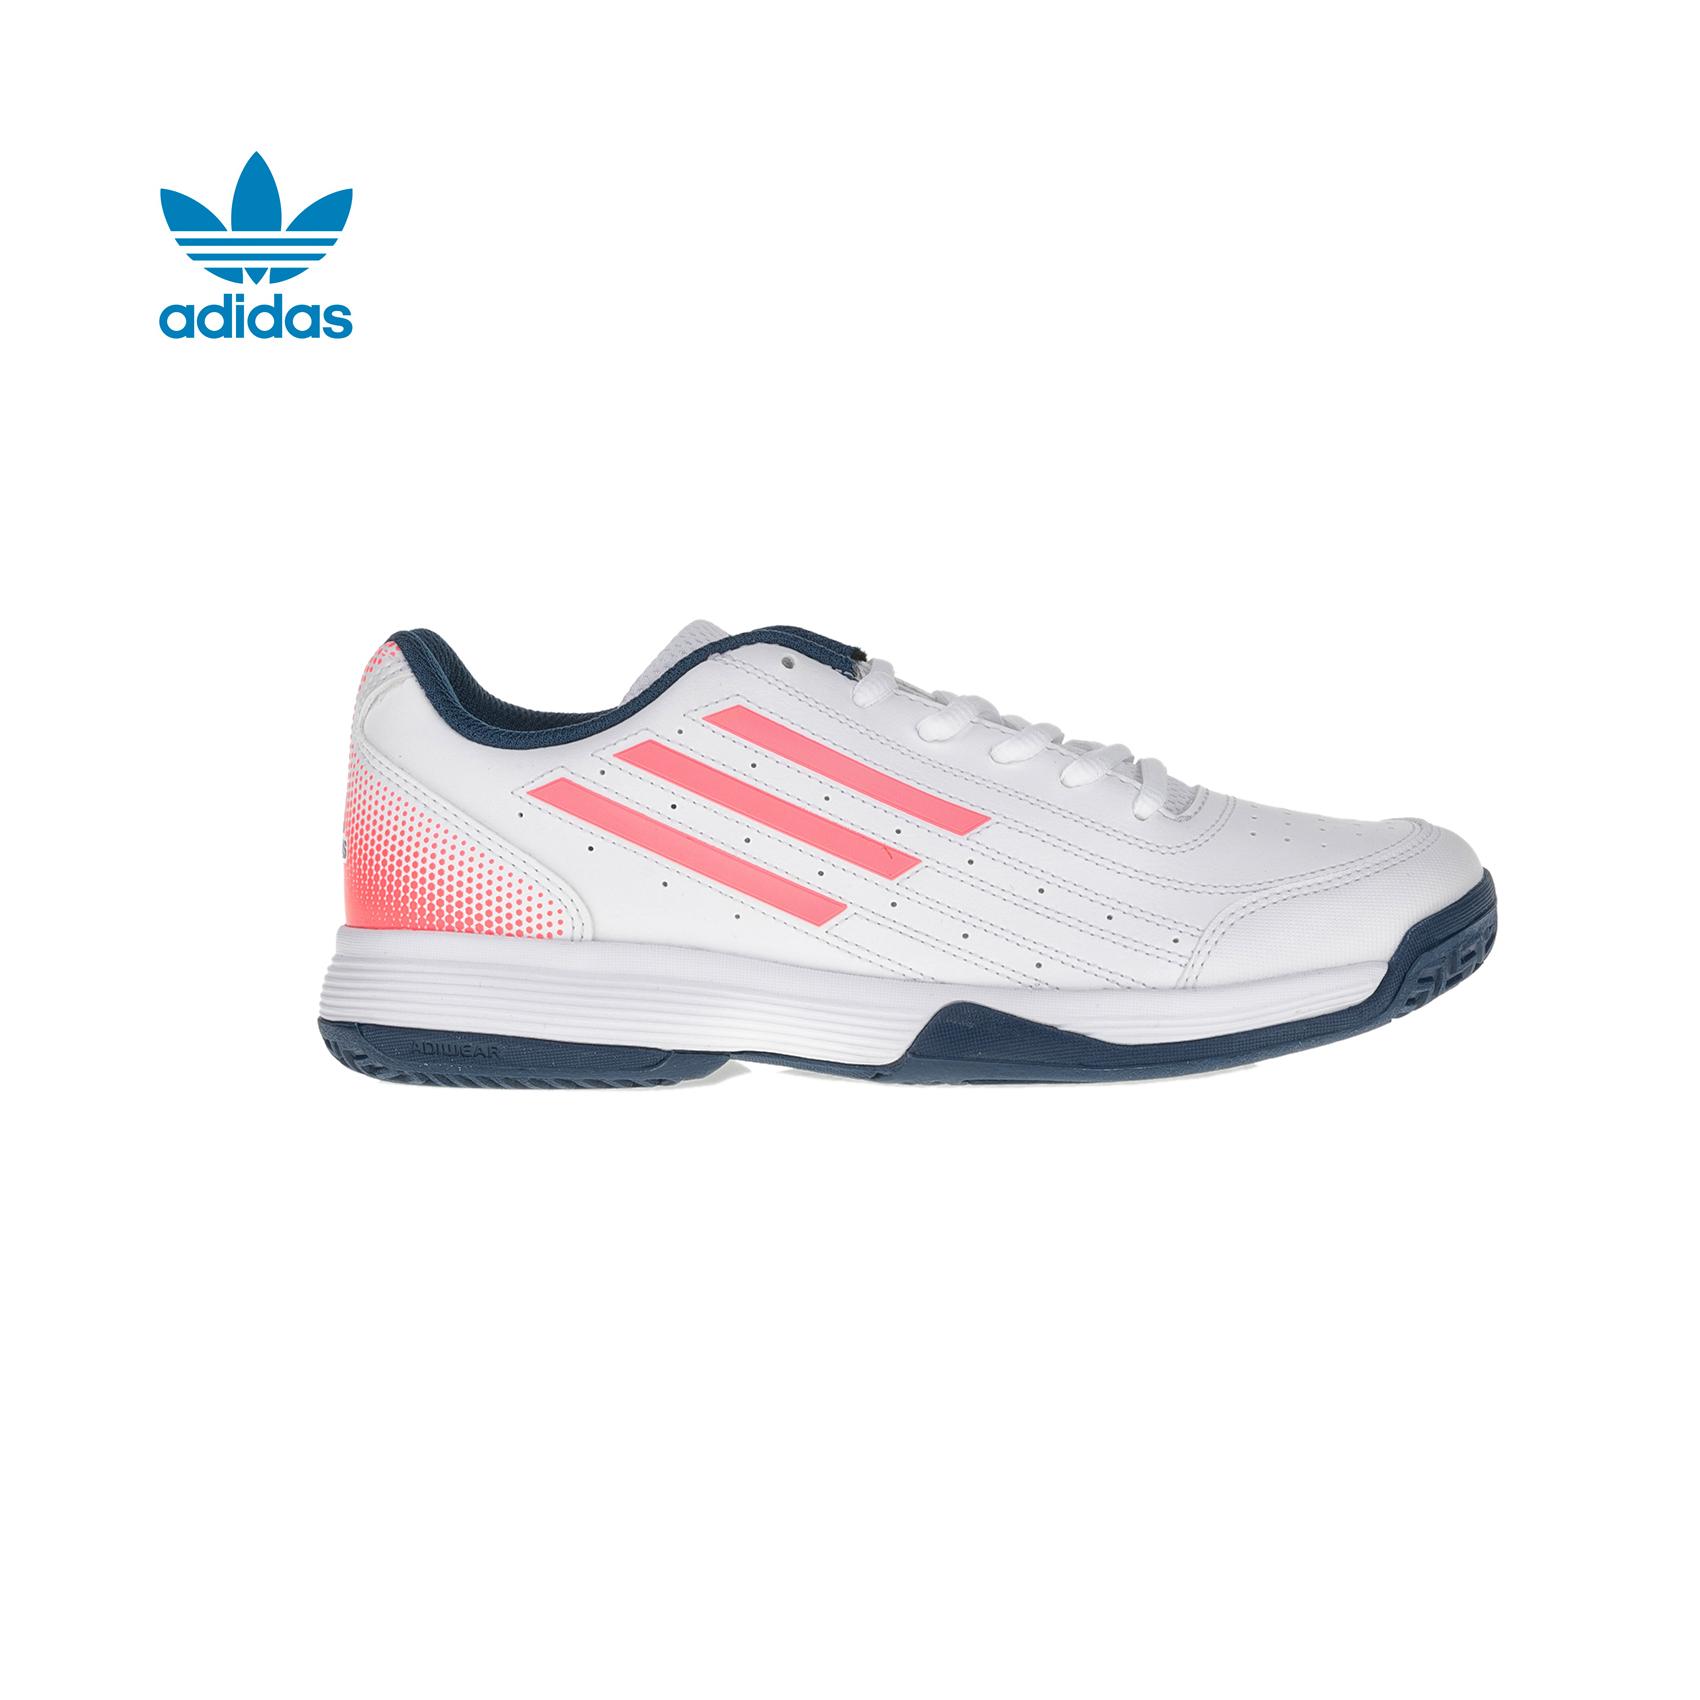 adidas Originals – Παιδικά παπούτσια adidas Sonic Attack λευκά